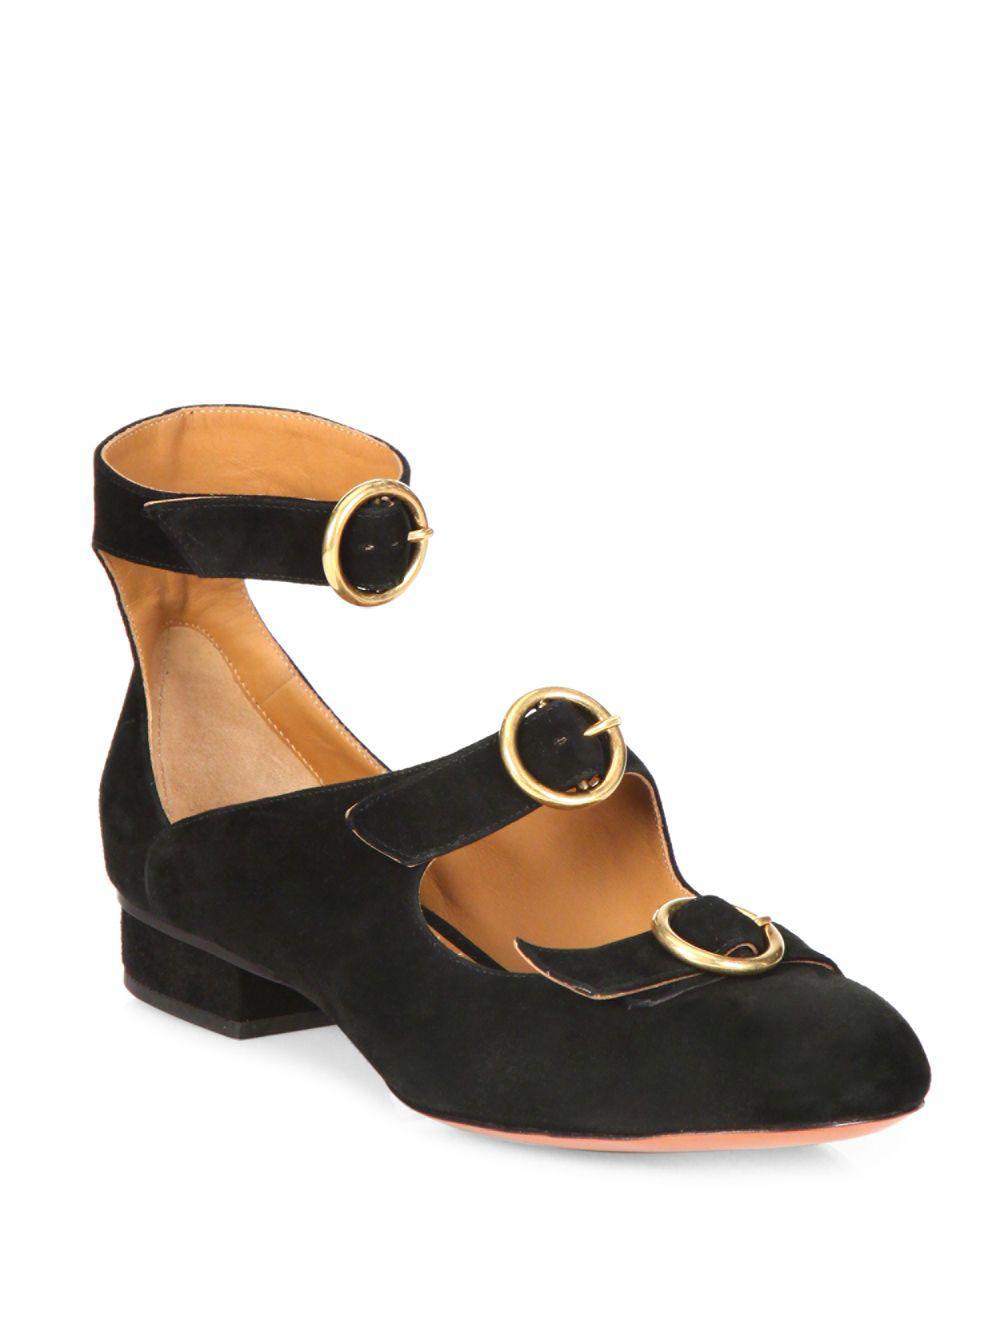 c11b7981f2c Lyst - Chloé Multi-strap Suede Ballet Flats in Black - Save 51%